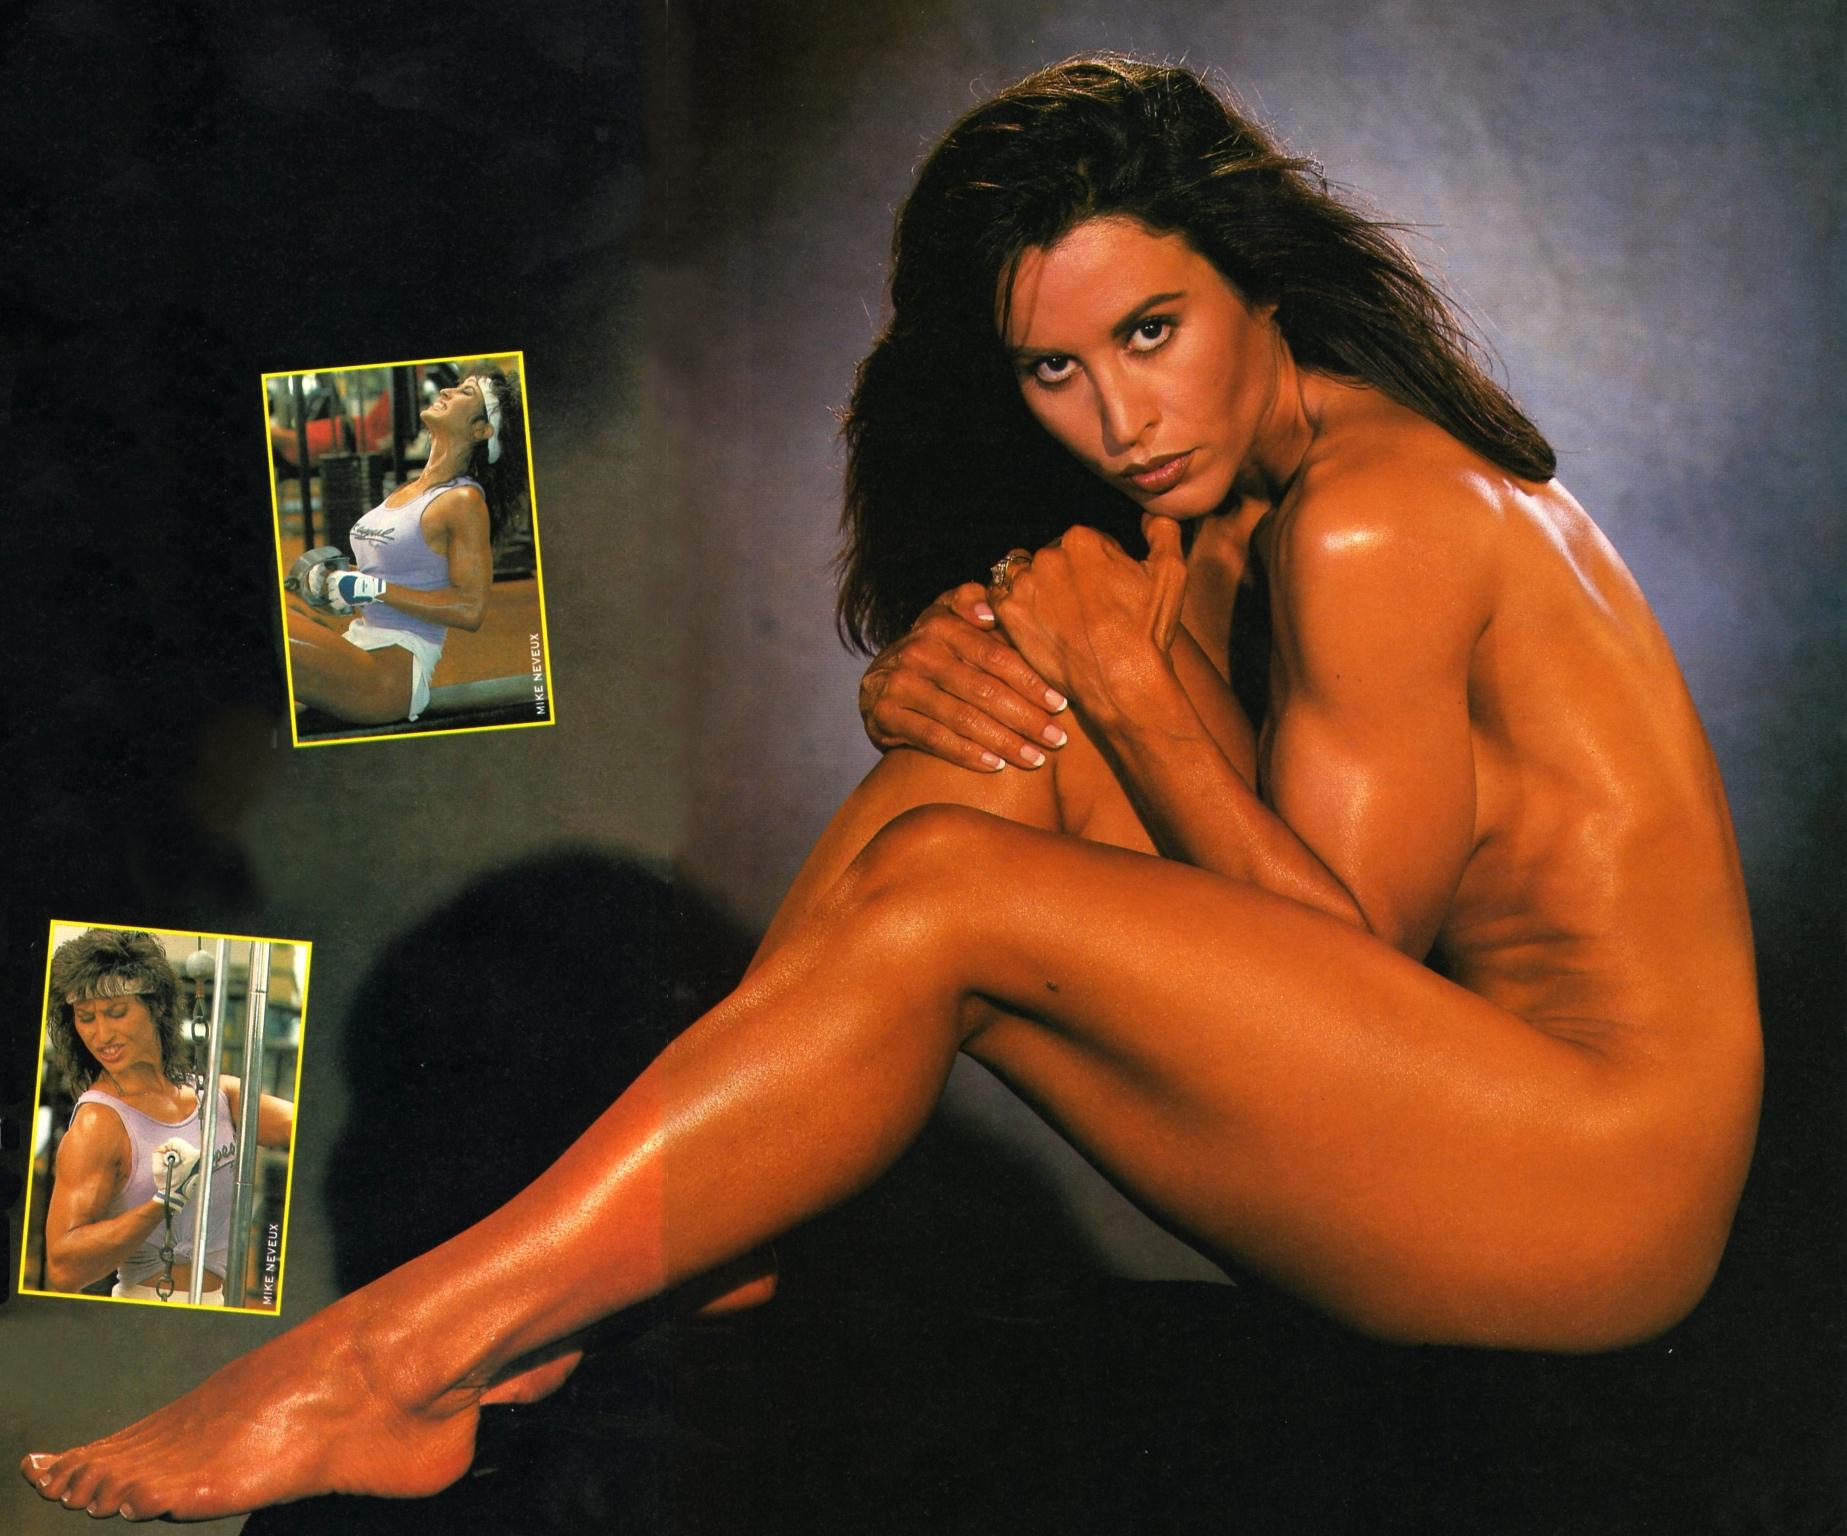 av magazine pacificgirls.com